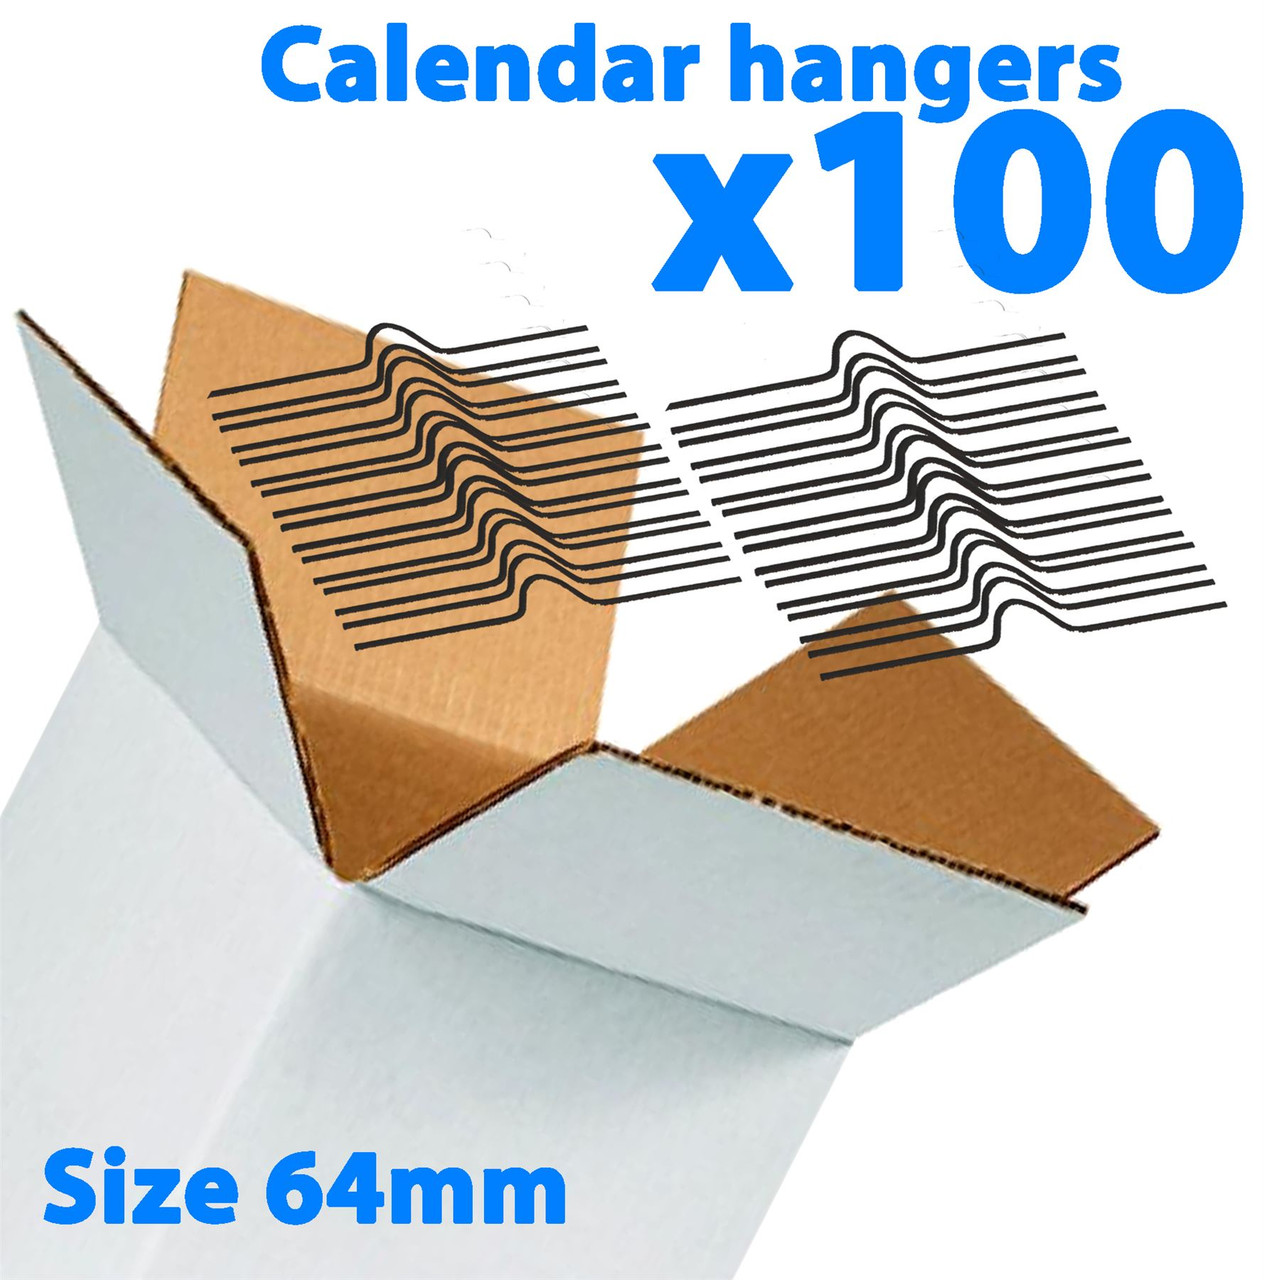 Galaxy 64mm Calendar Wire Hangers x 100